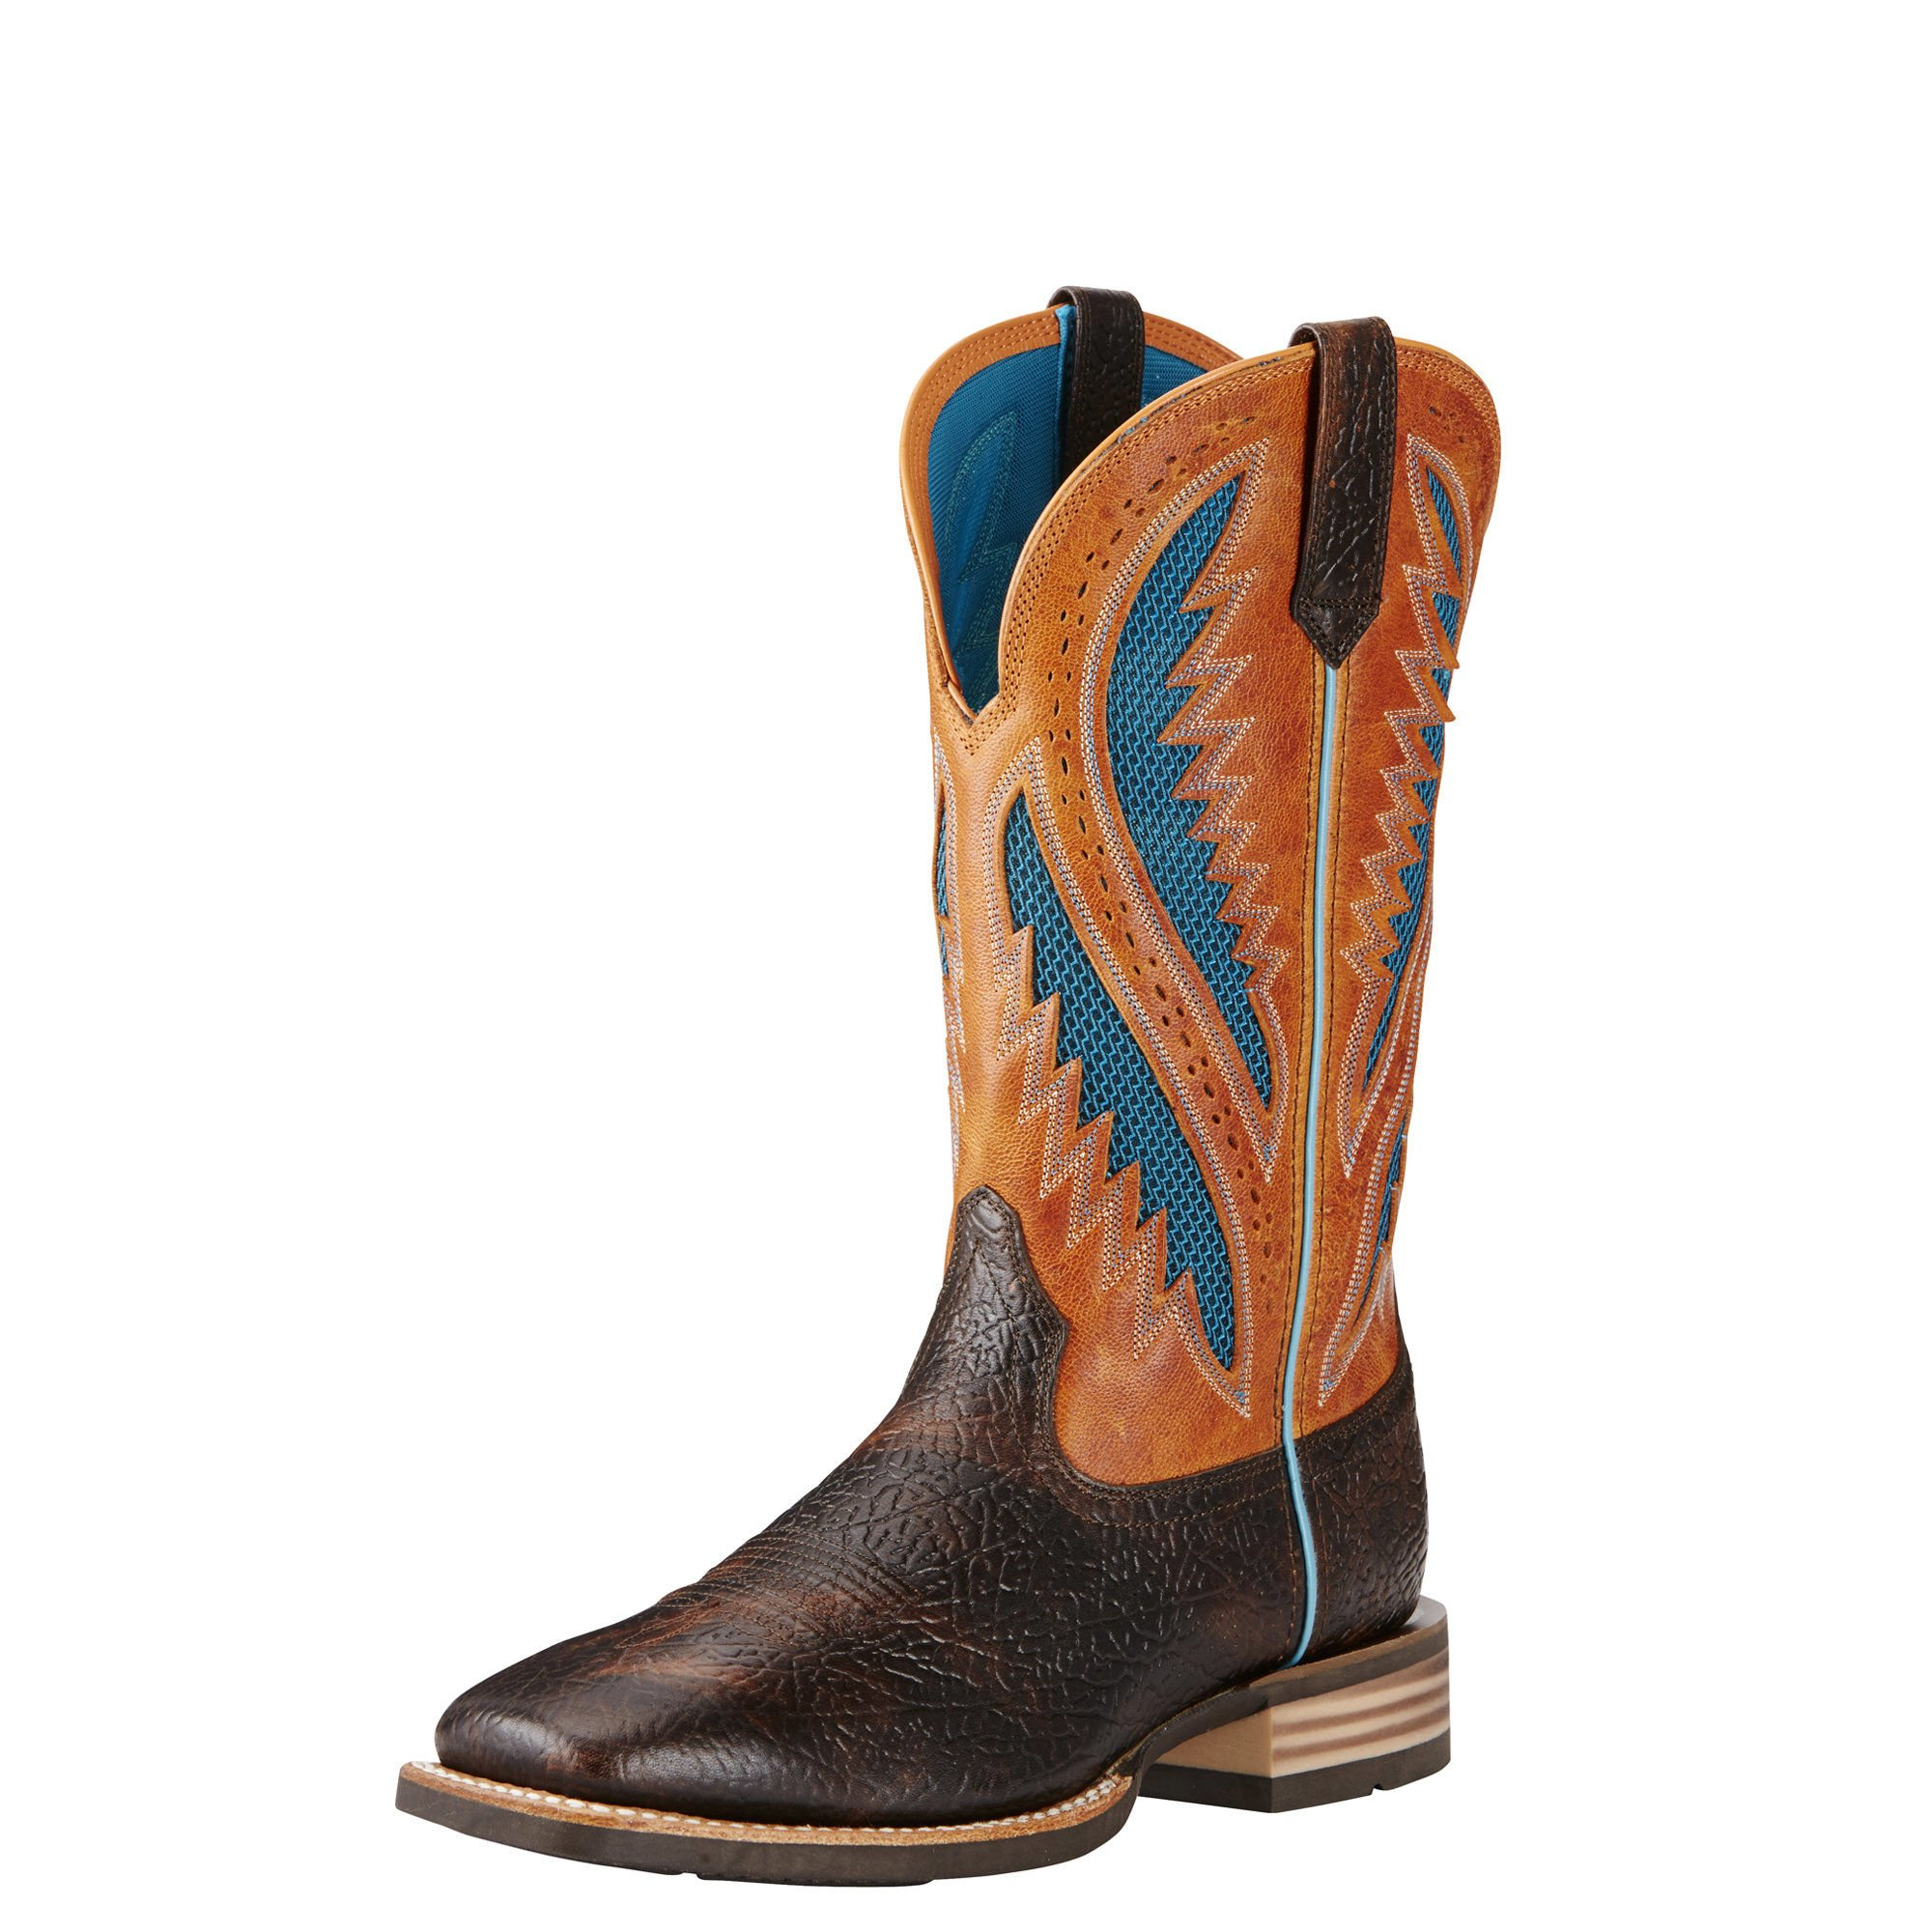 Ariat Men's Quickdraw Venttek Western Cowboy Boot, Glazed Bark, 9.5 D US